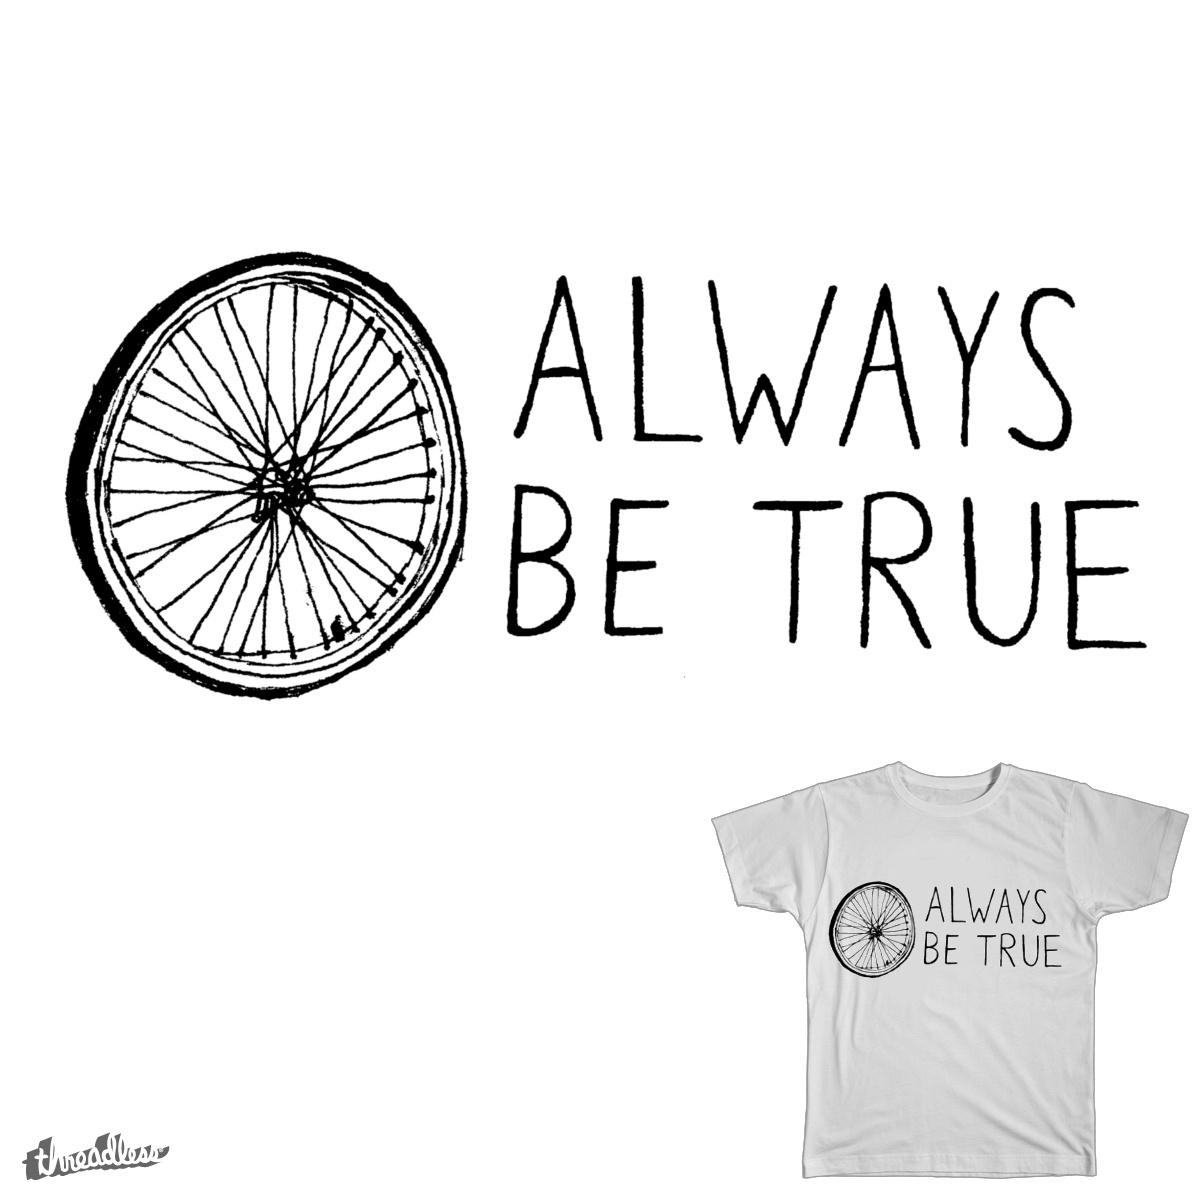 Wheel Talk by jamesashley on Threadless